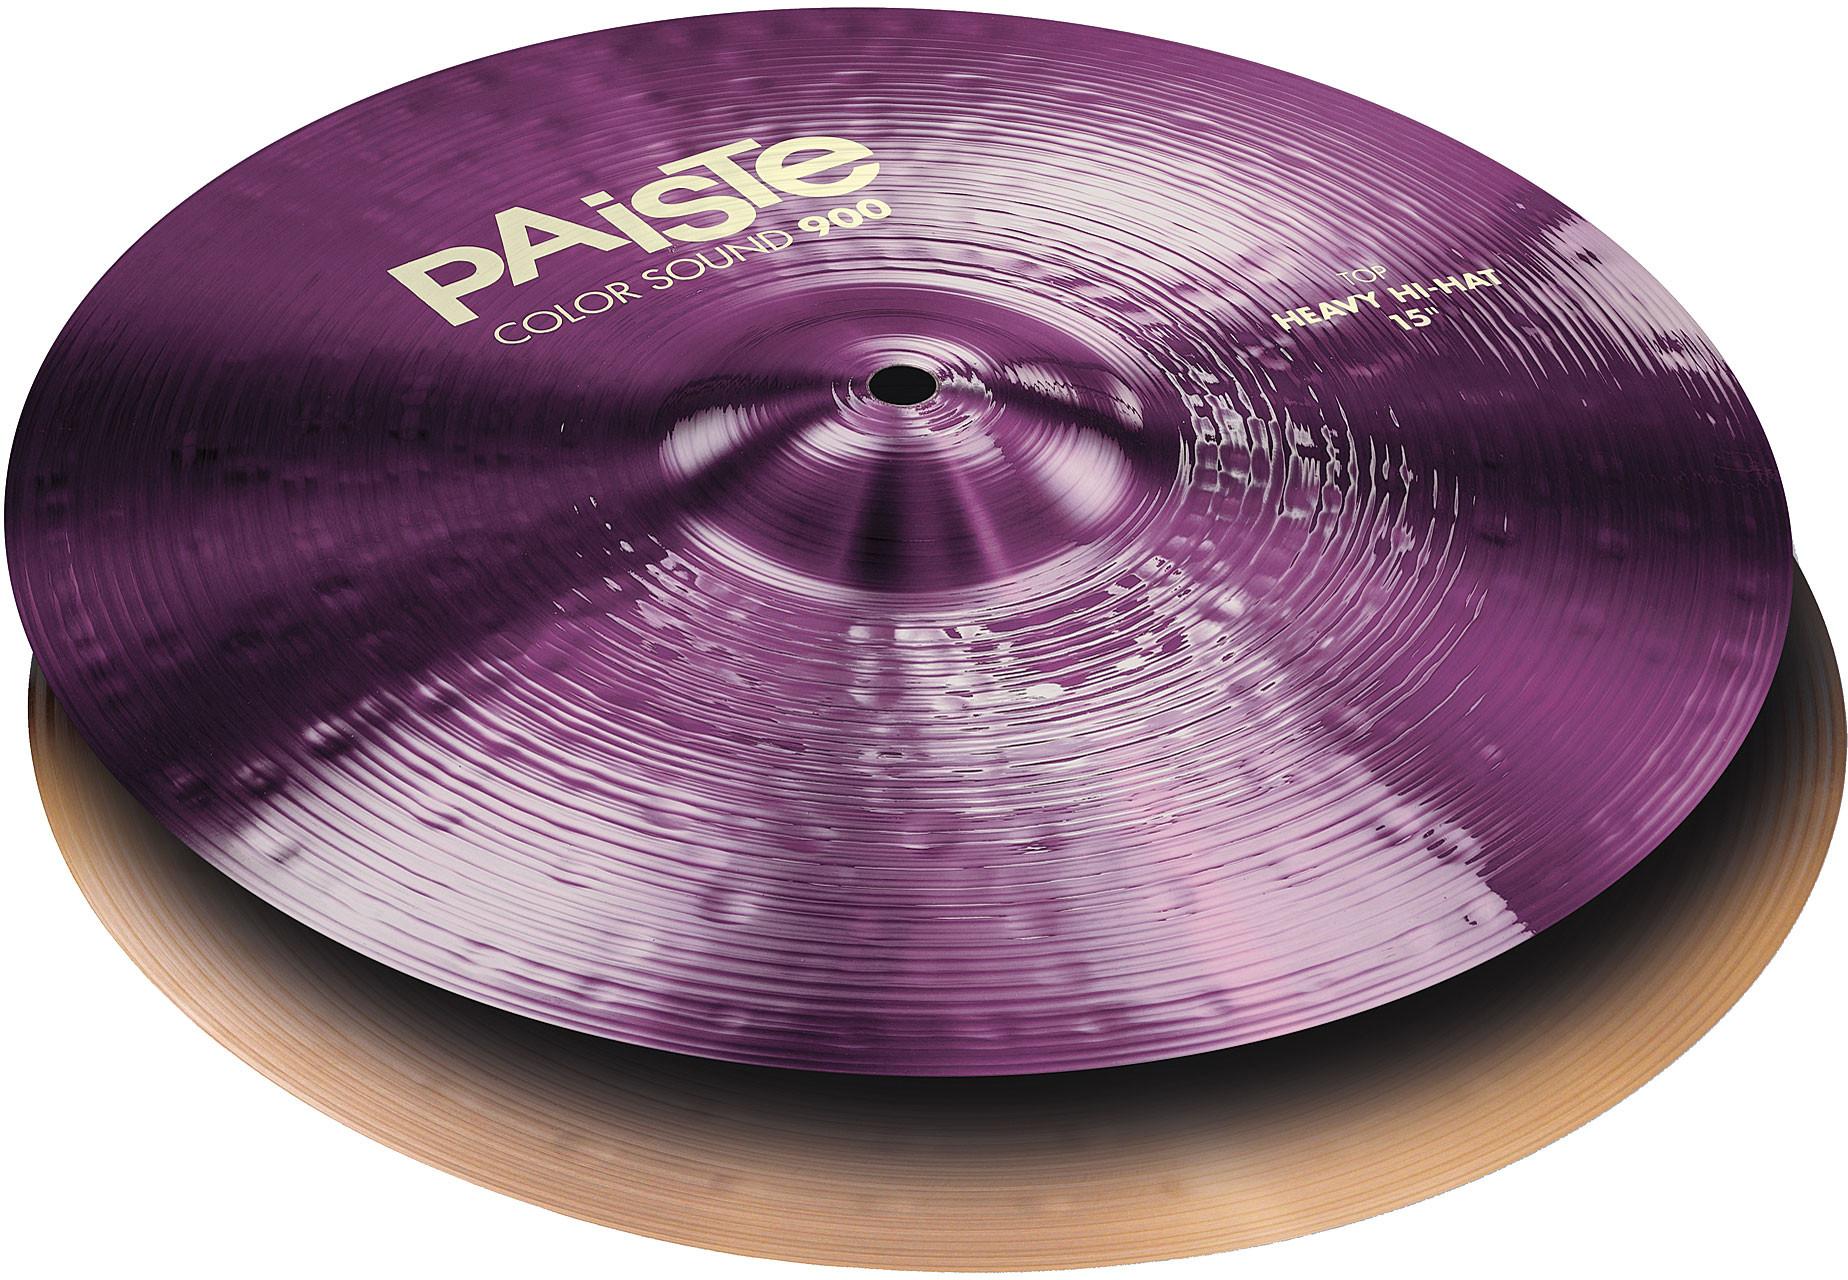 PAISTE-900CS-PUHHH15-Paiste-900-Color-Sound-Heavy-Hi-Hat-15-Purple-sku-610005184